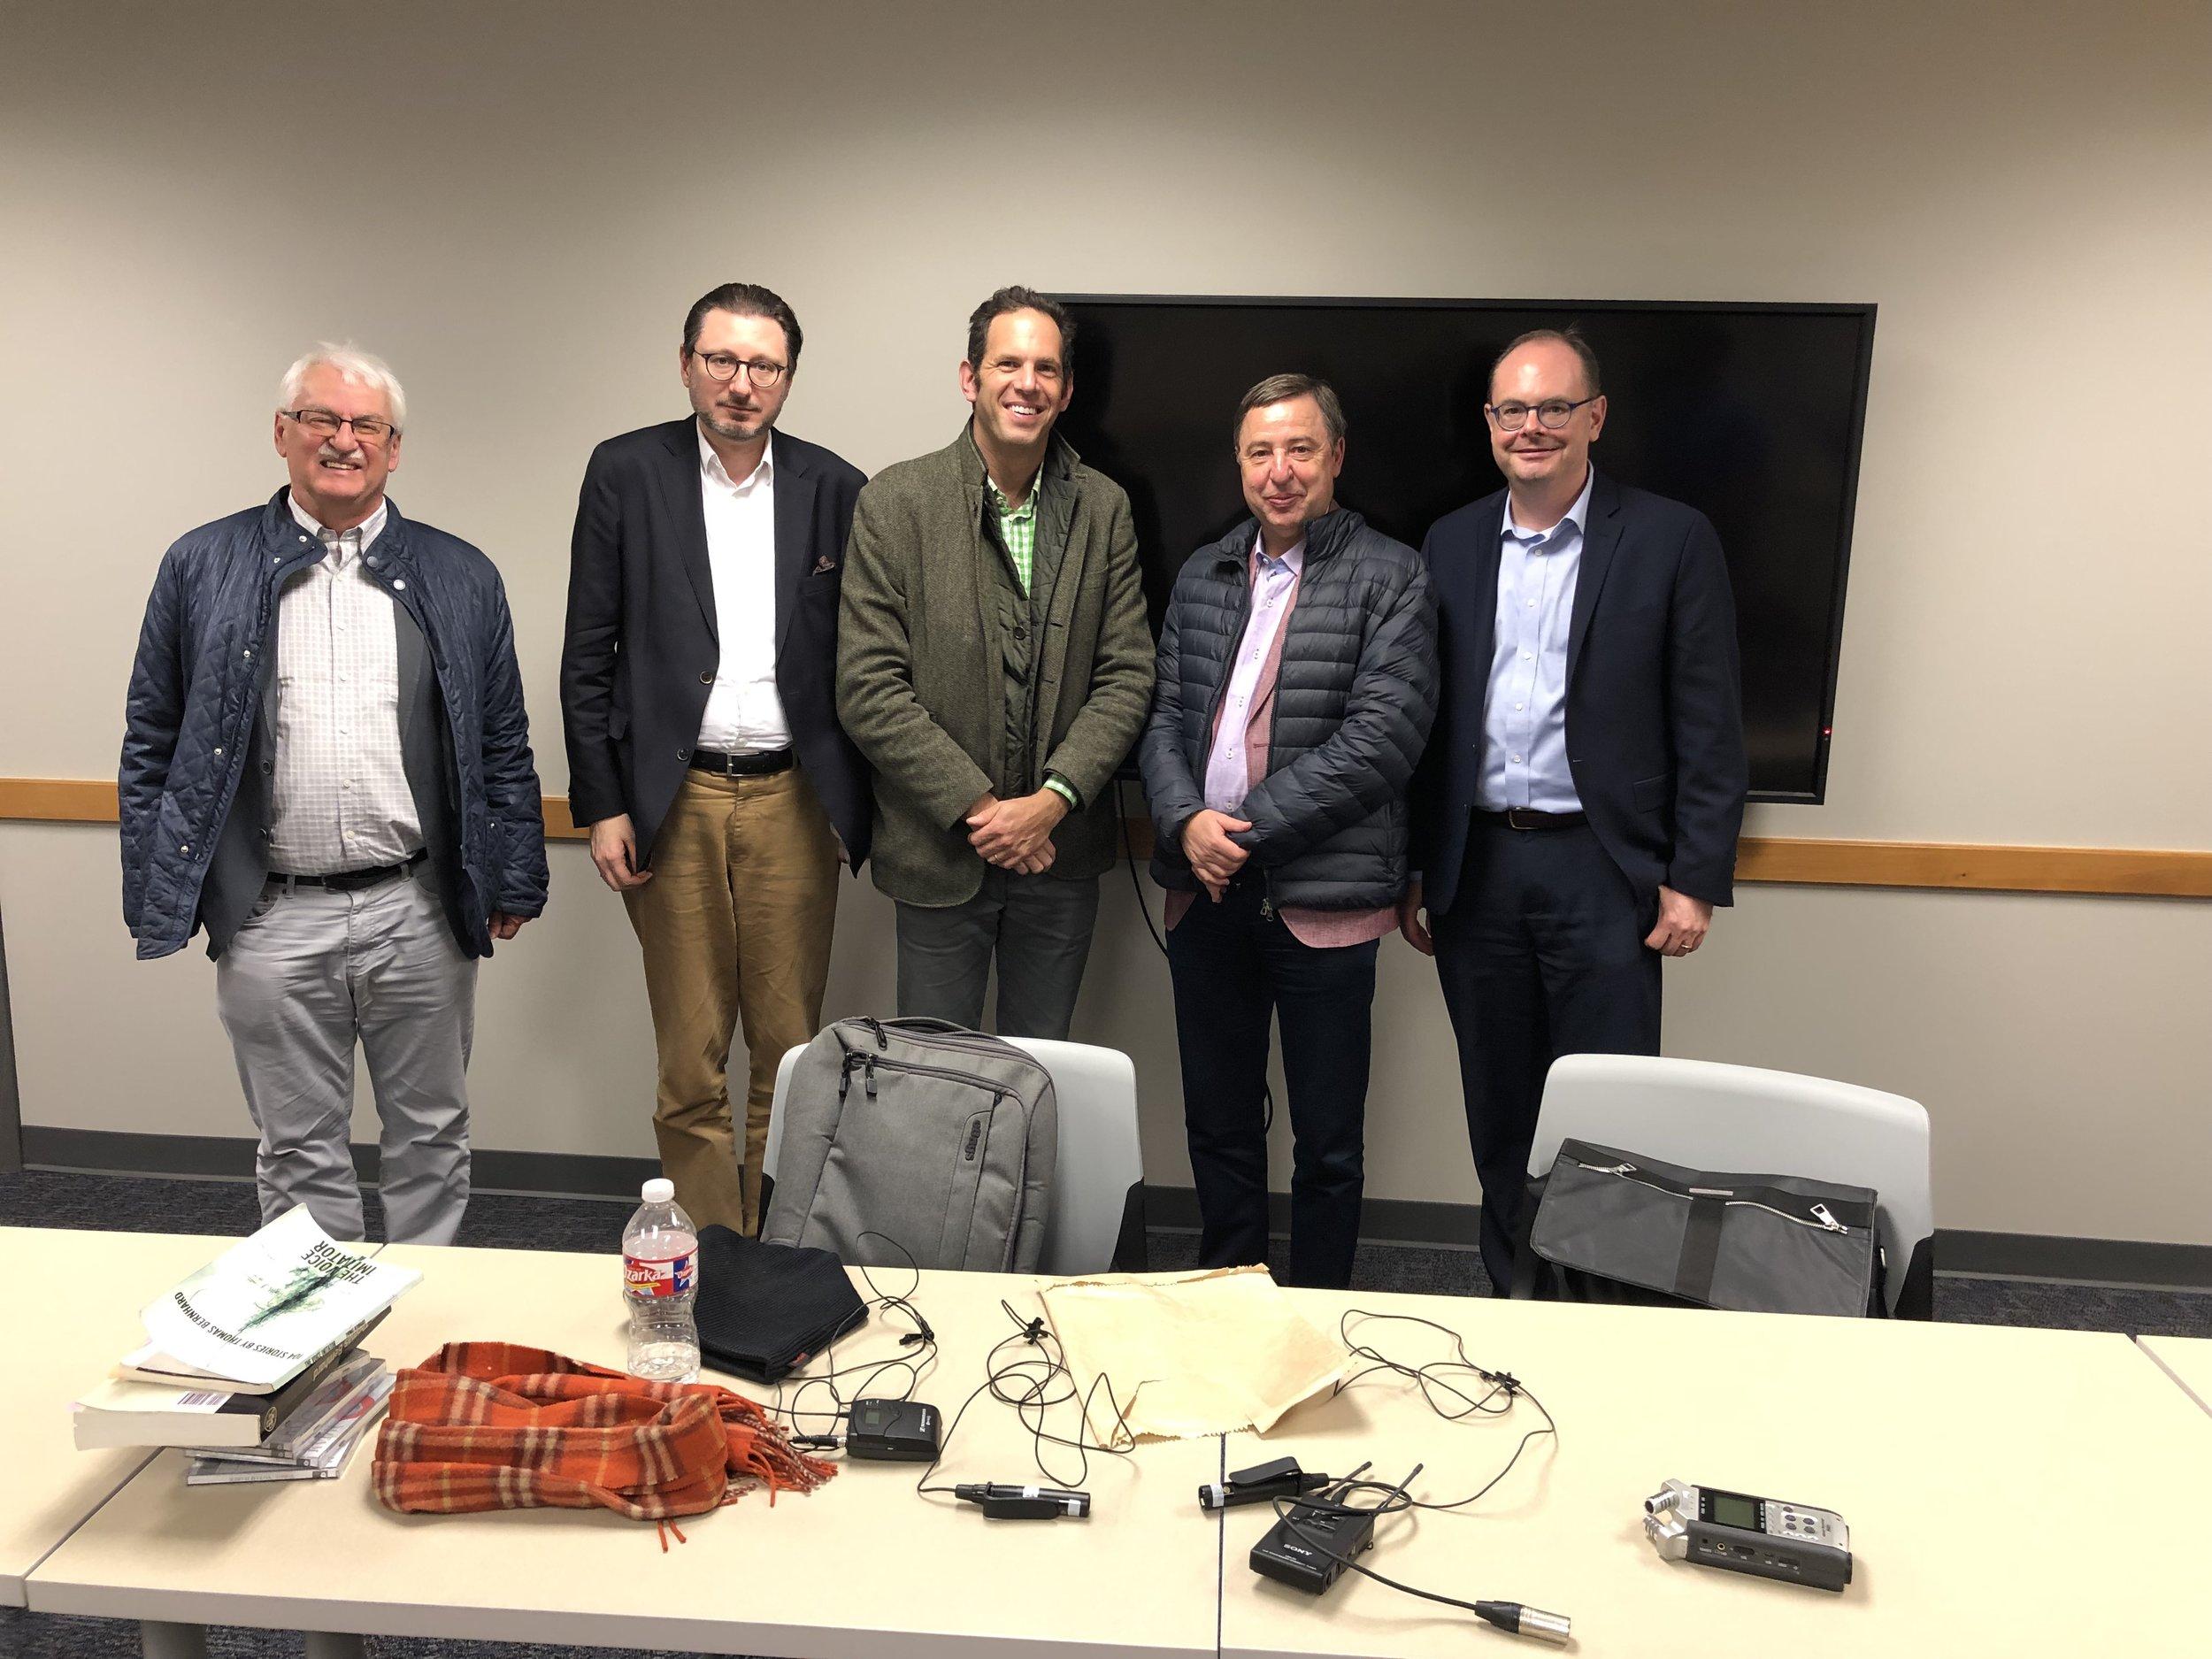 From left: Guenter Bischof, Michael Haider, Yotam Haber, Peter Hoeng, Gregor Thuswaldner.